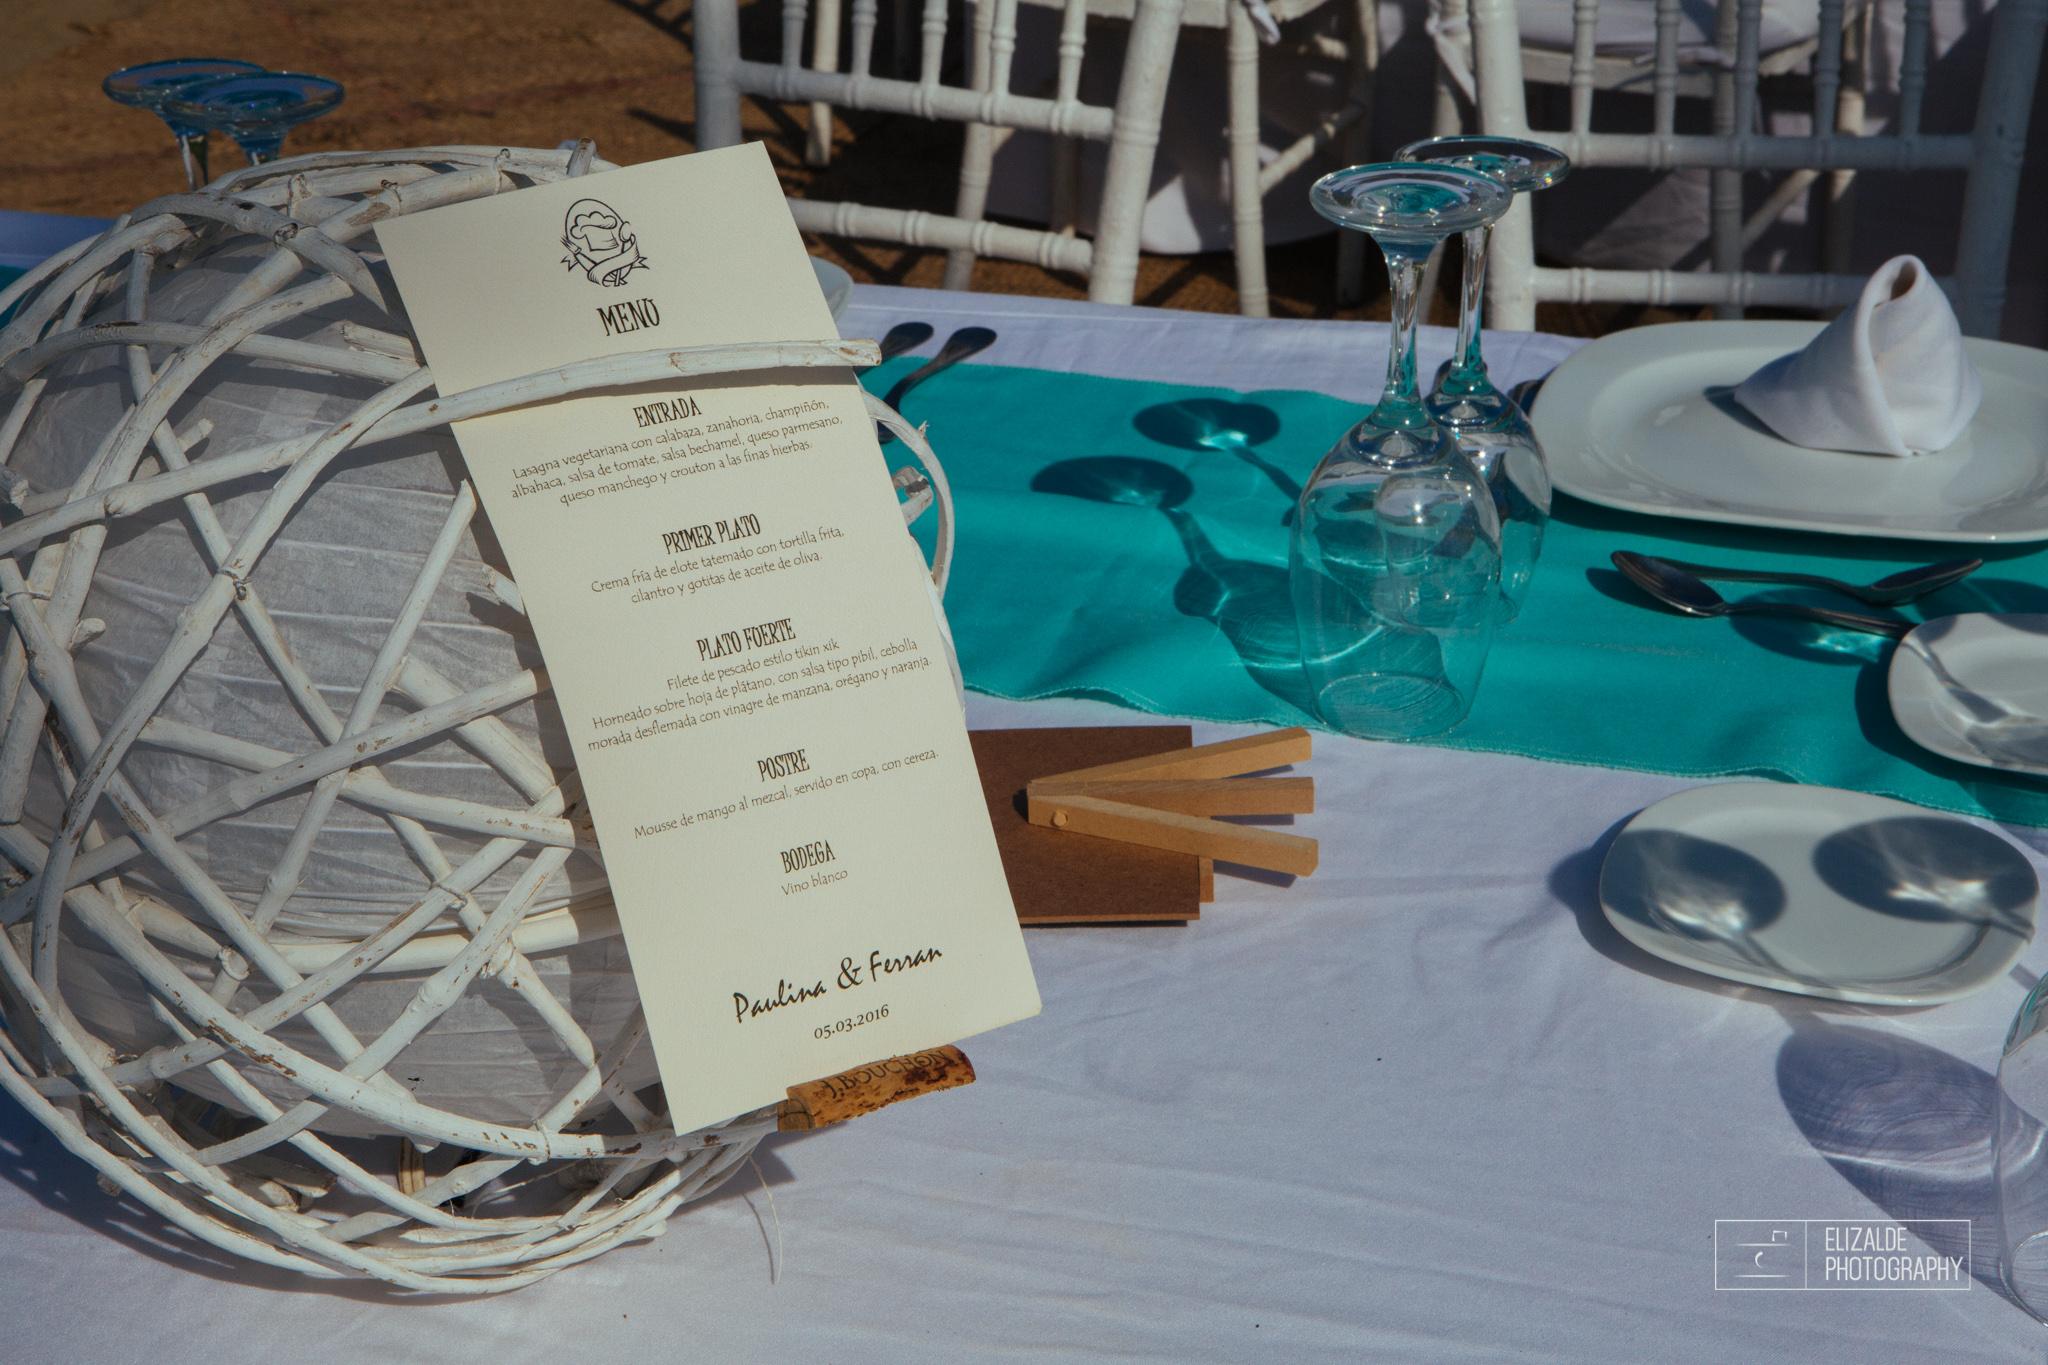 Pay and Ferran_Acapulco_Destination Wedding_Elizalde Photography-34.jpg